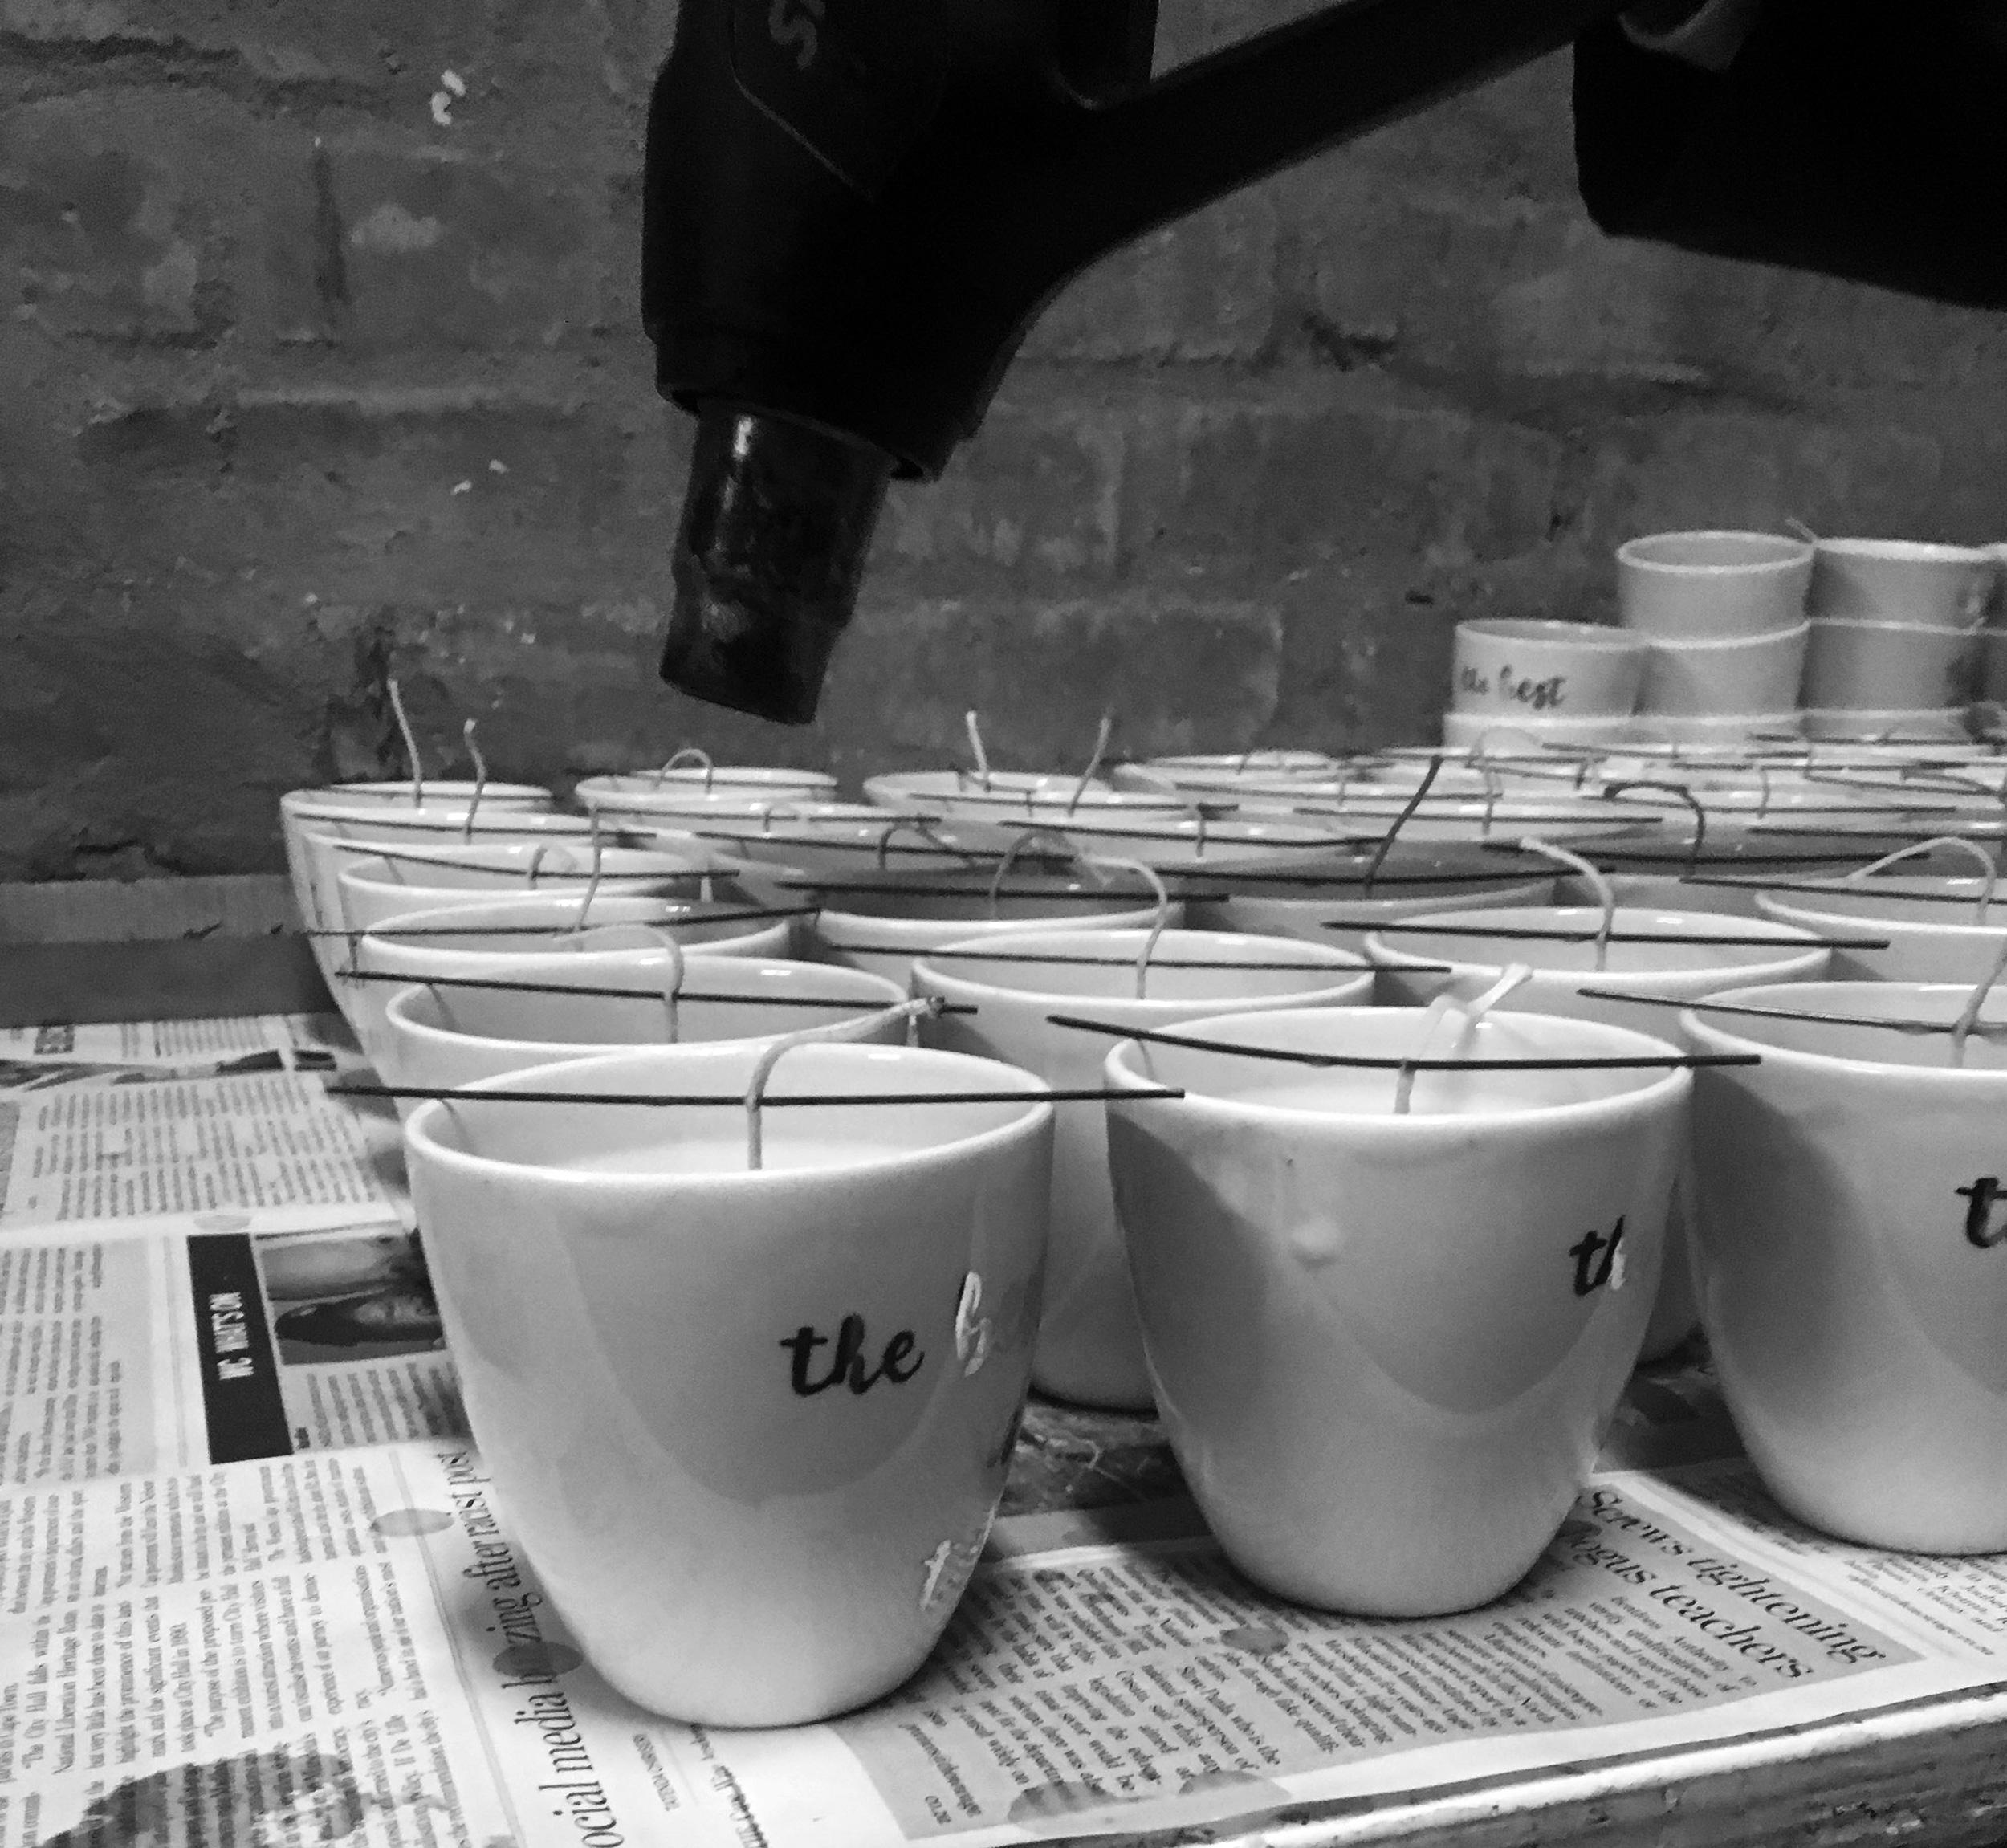 kapula-handmade-filled-ceramic-candles-drying-wax.jpg